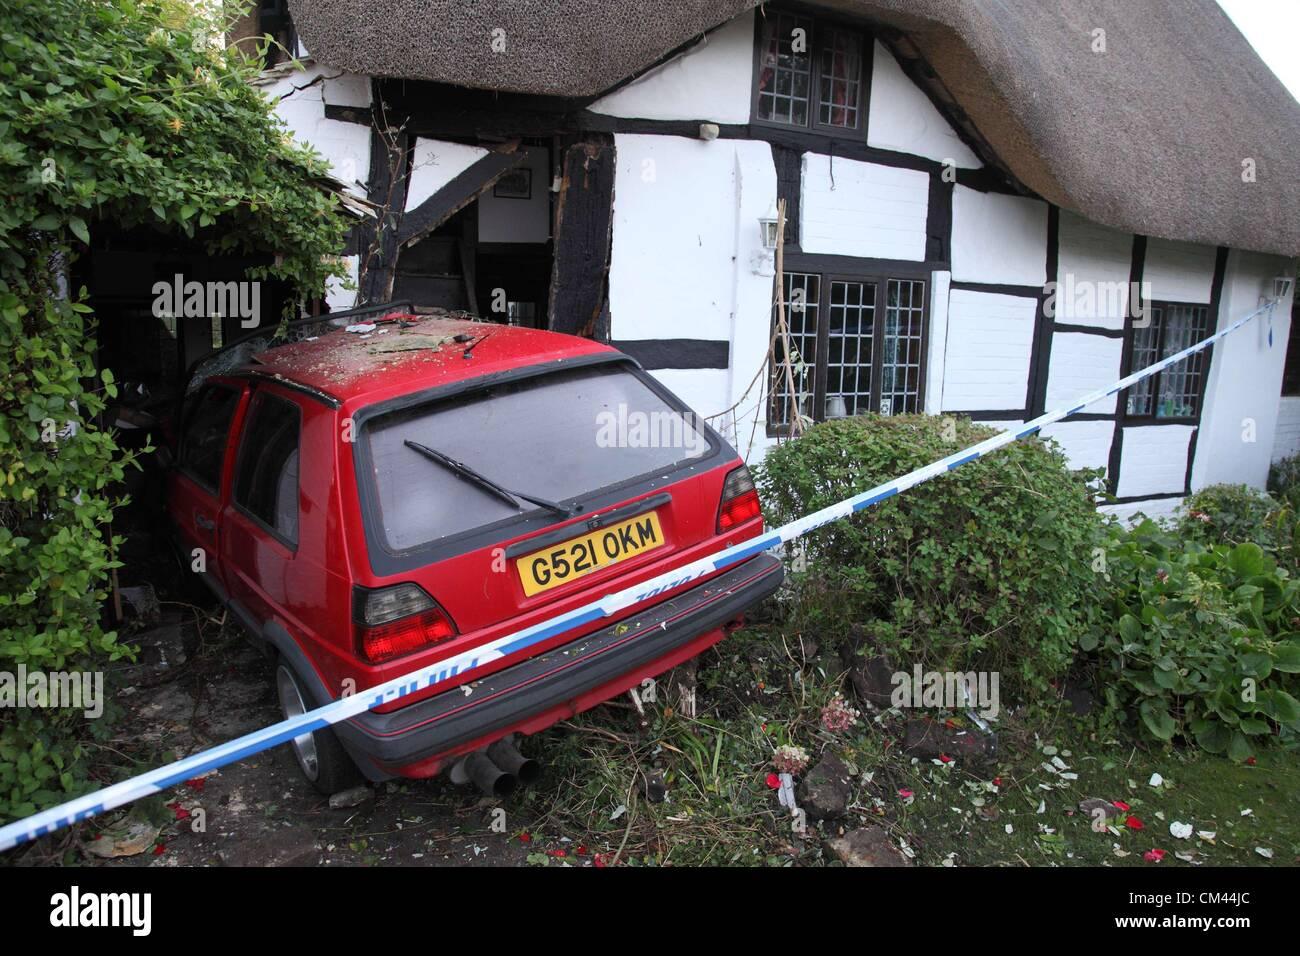 a-volkswagen-golf-demolished-the-corner-